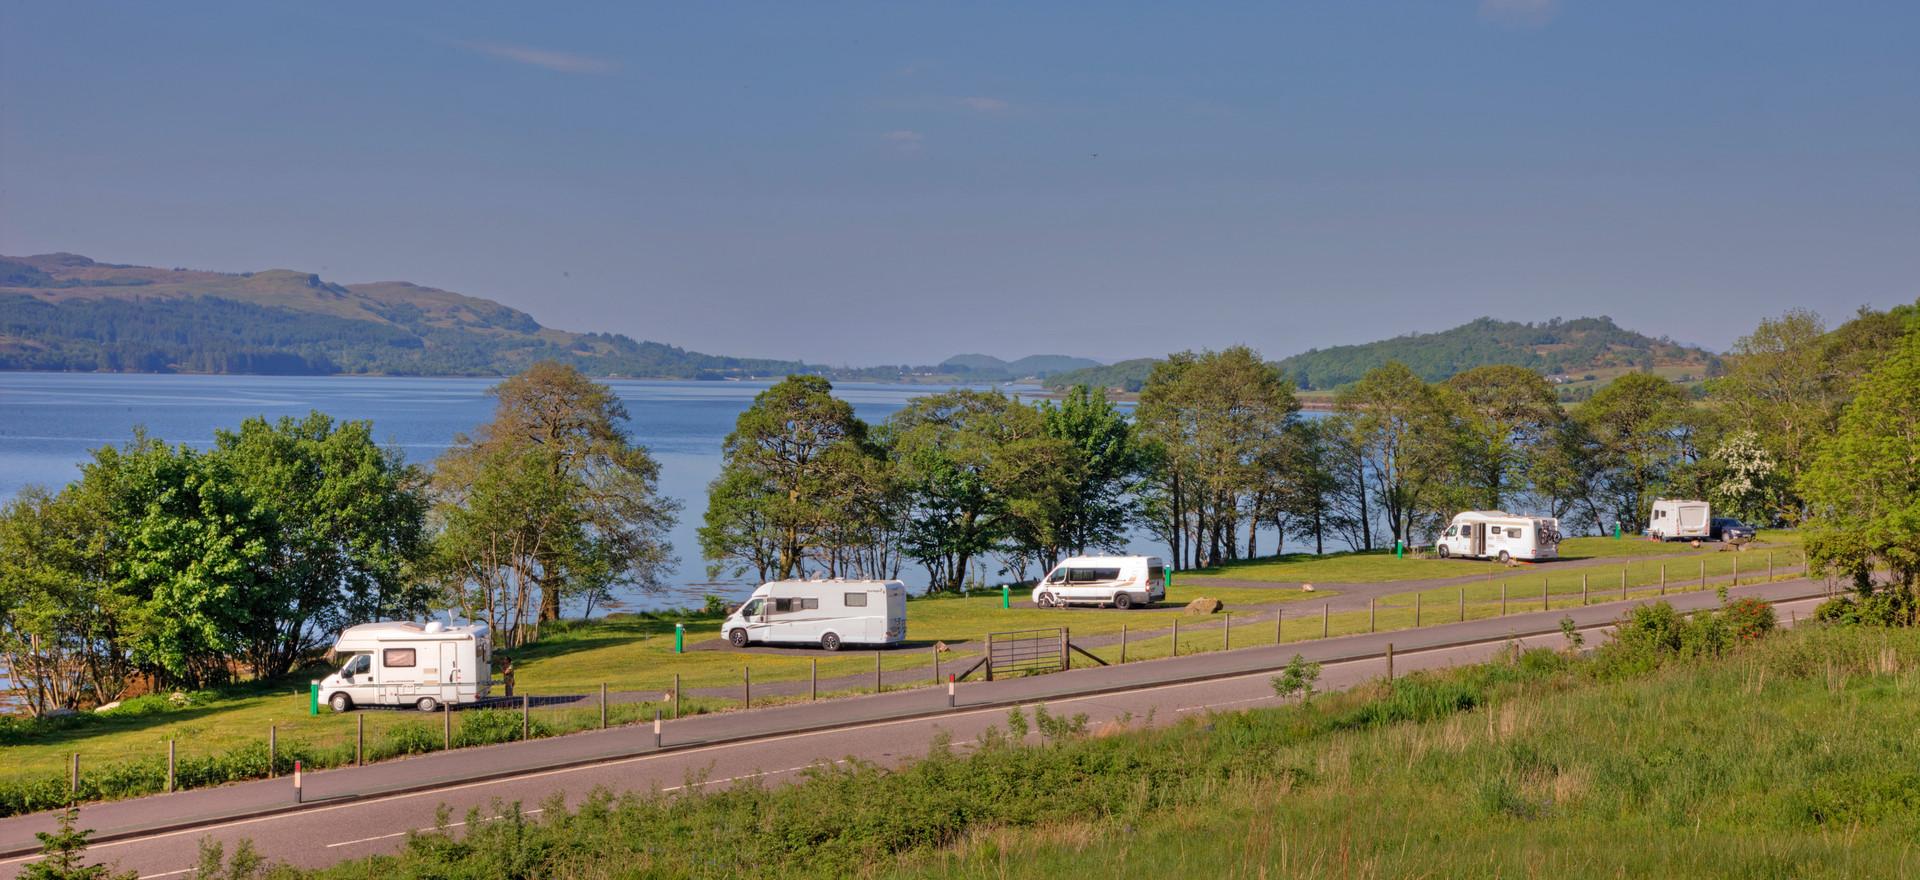 0I5D9865 caravan park.jpg